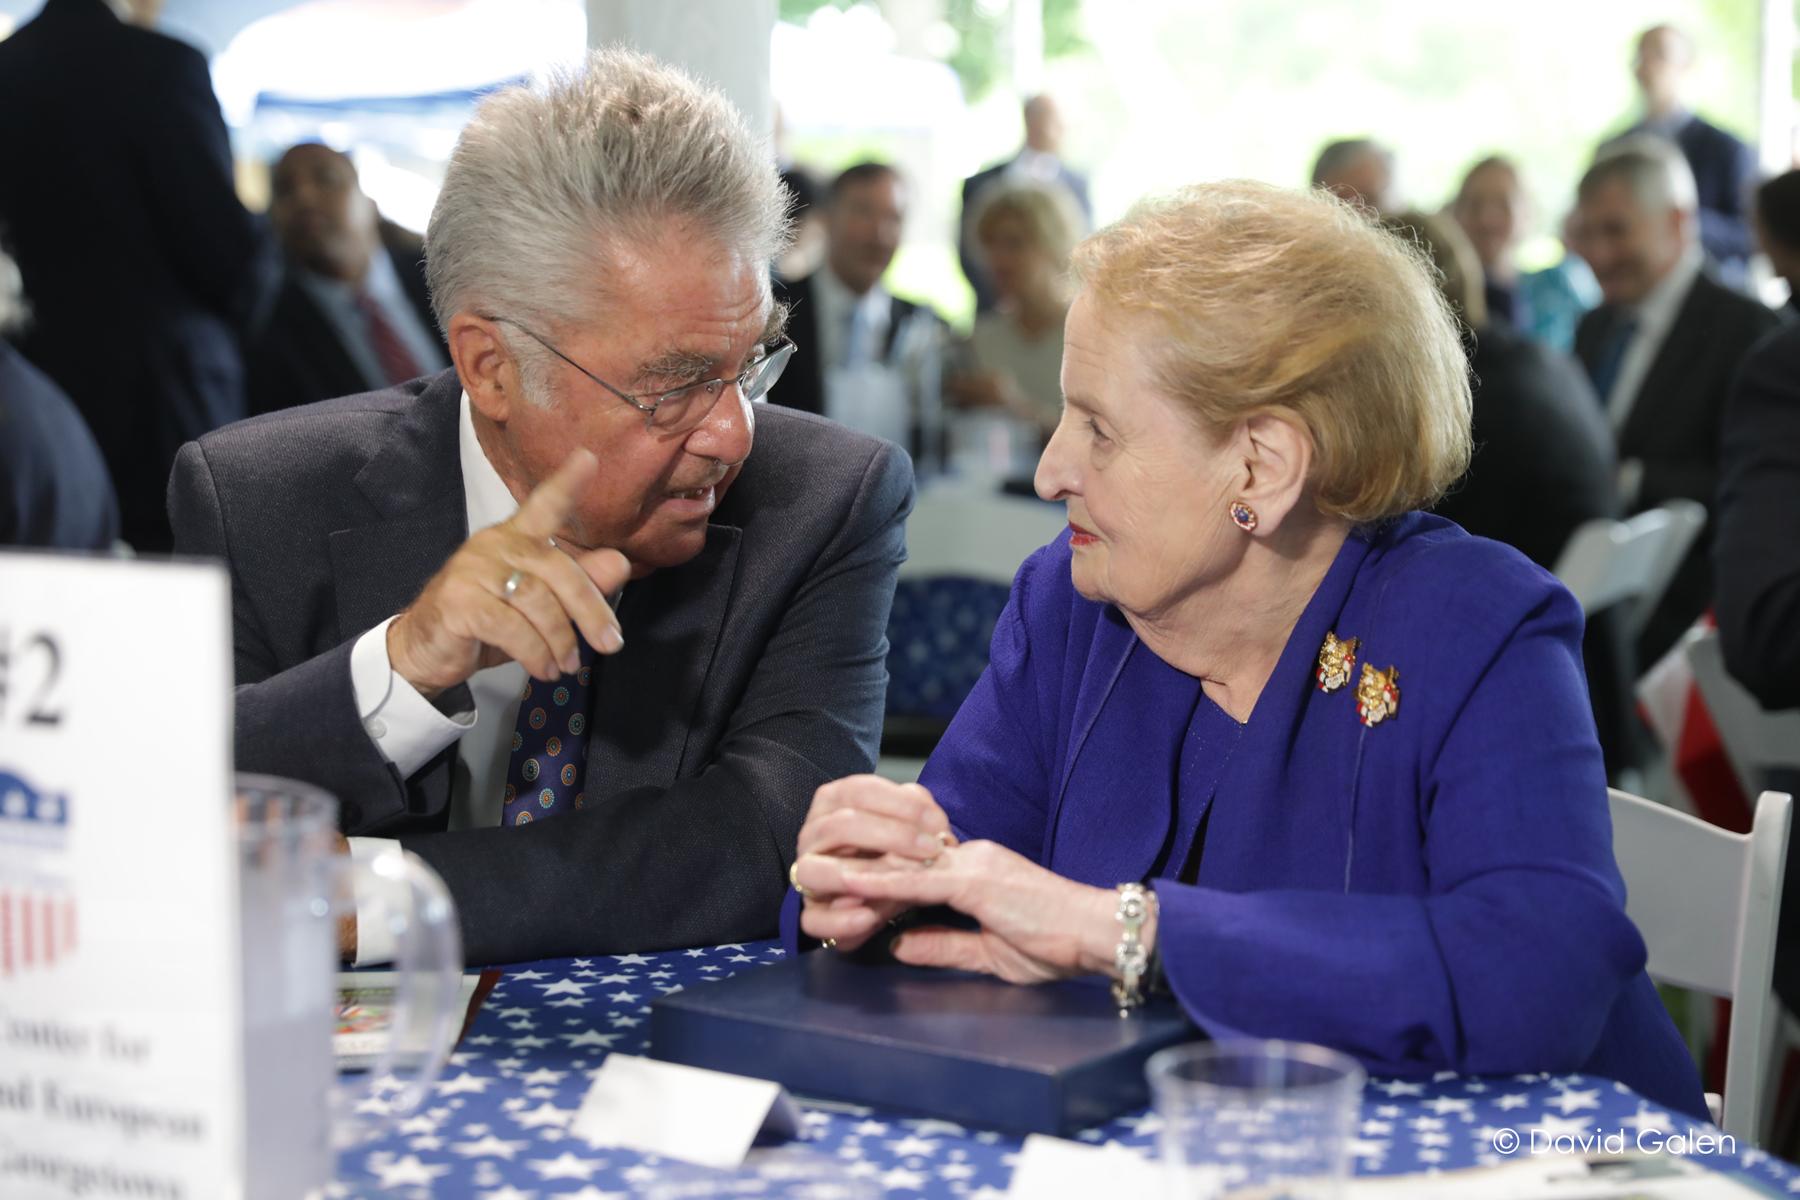 Dr. Heinz Fischer, former Federal President of Austria, and Dr. Madeleine Albright, former U.S. Secretary of State on June 5, 2017.